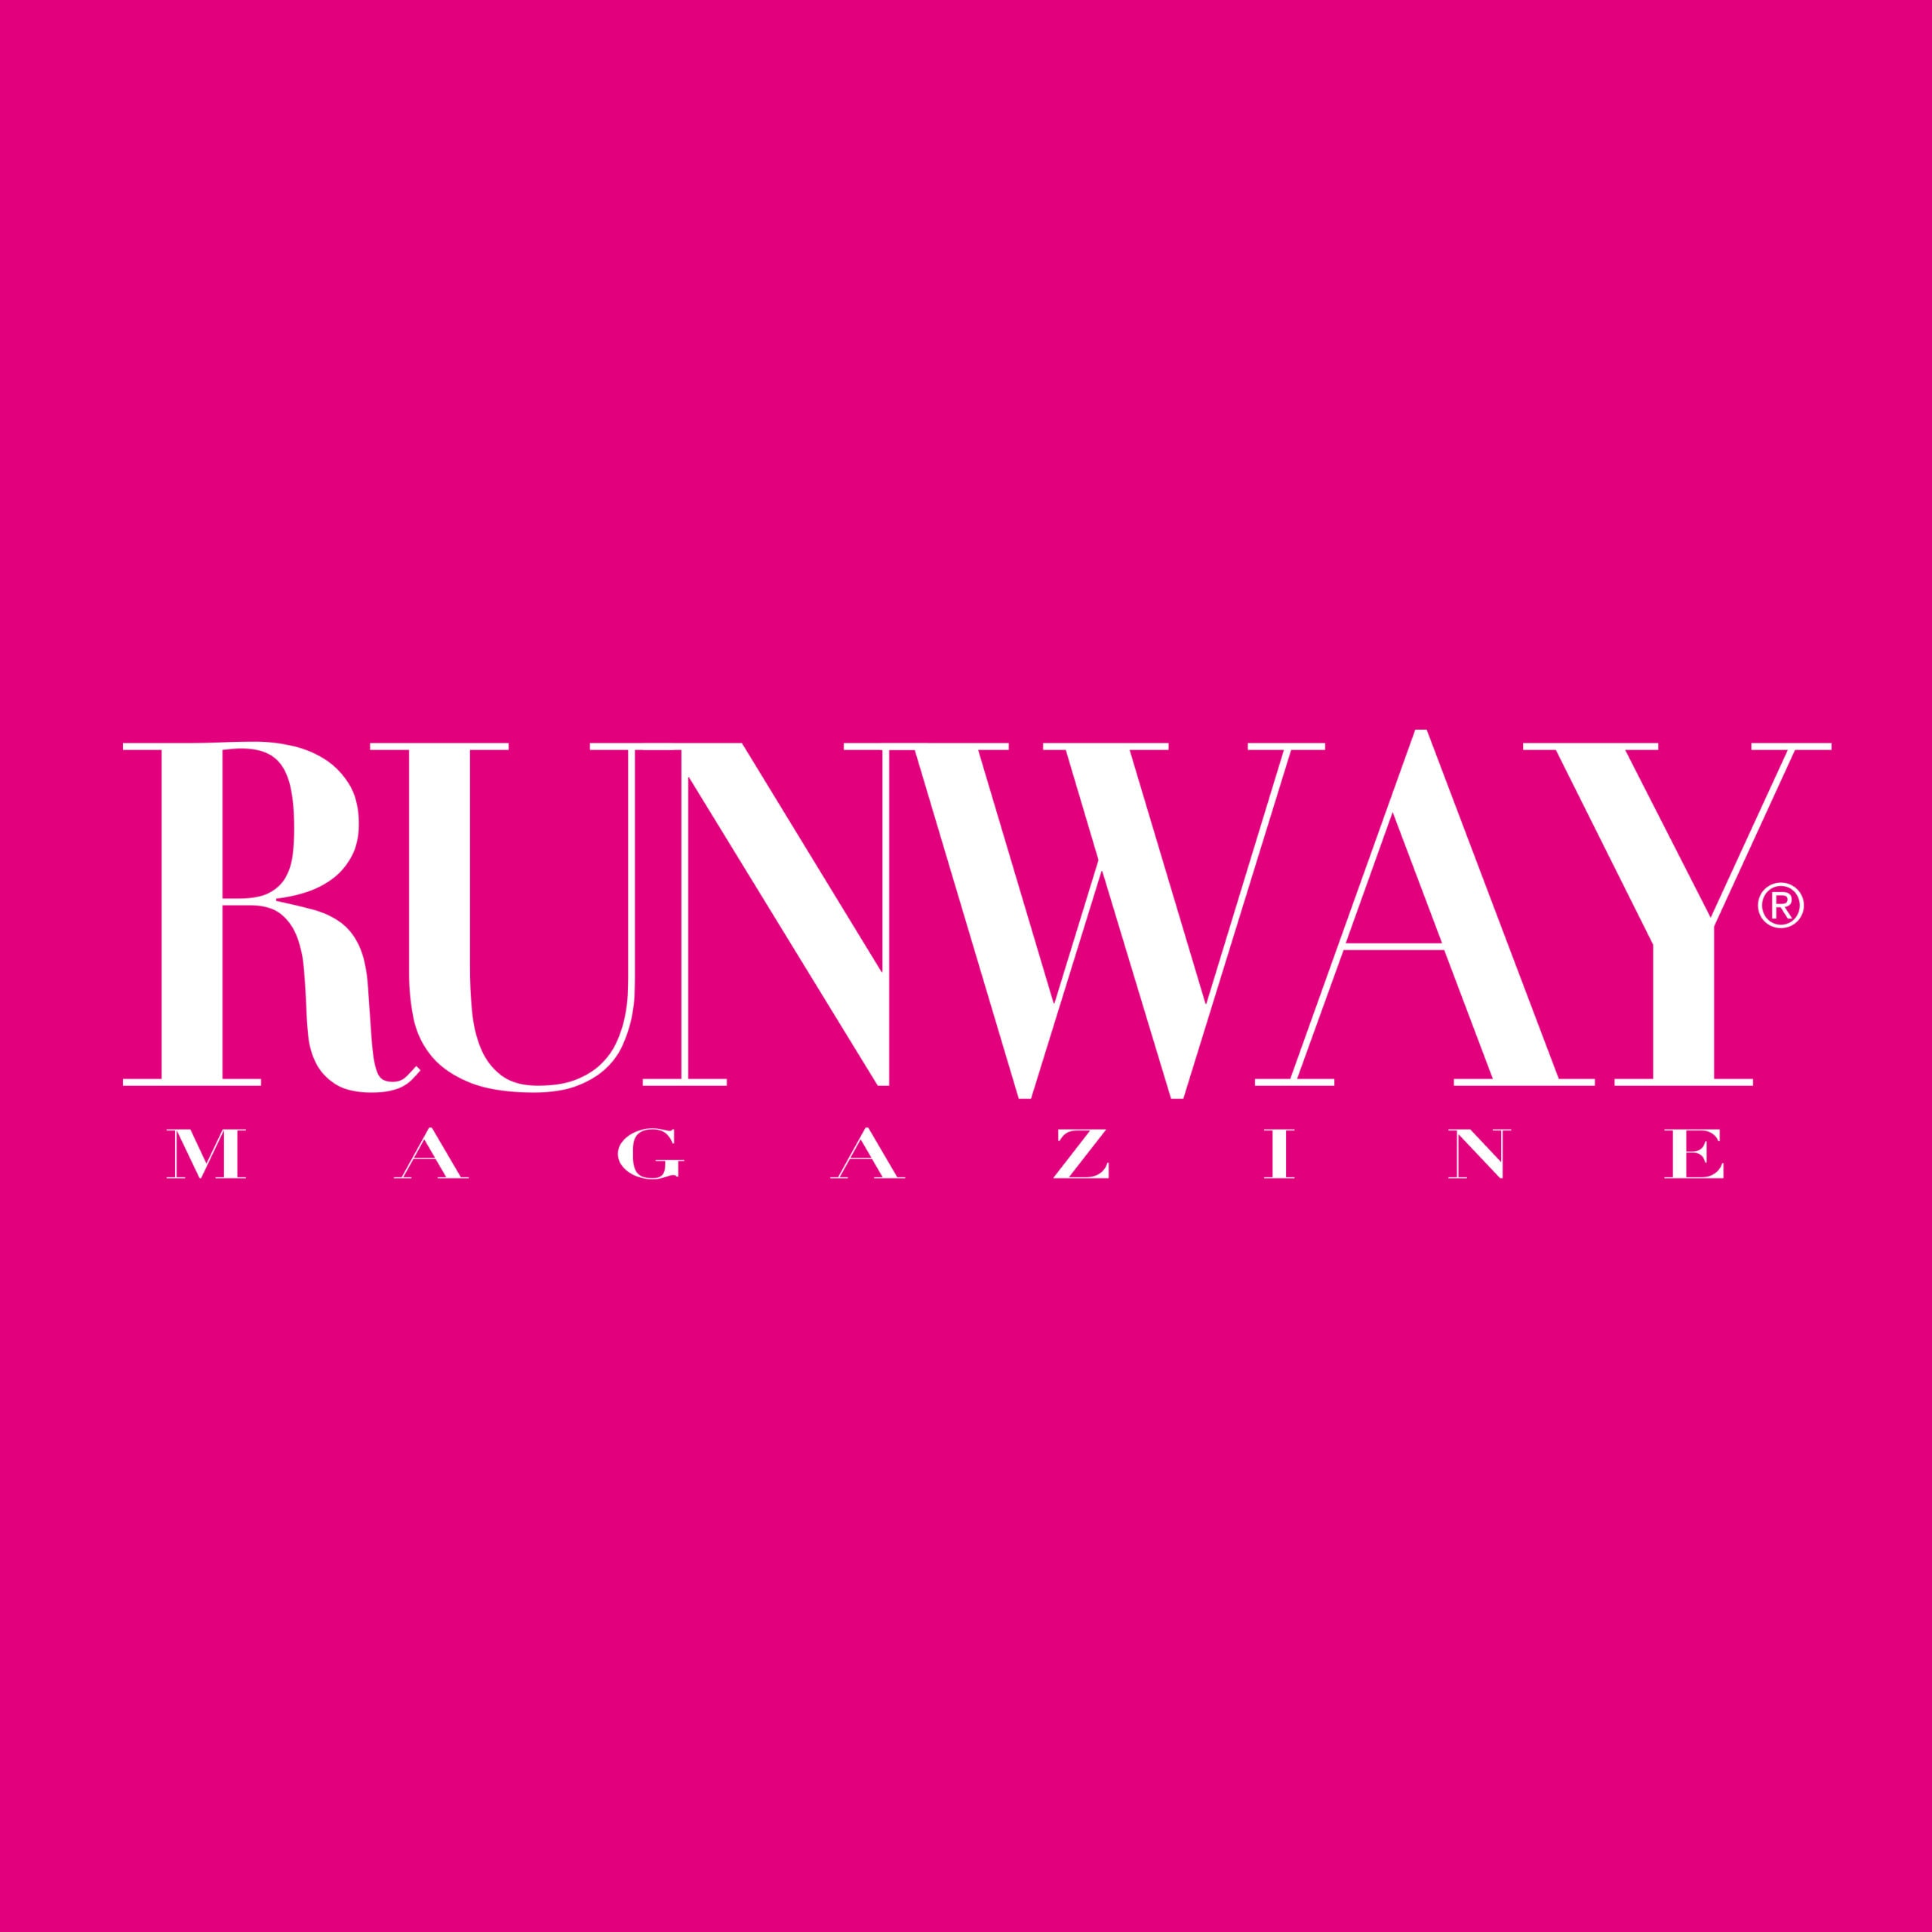 RUNWAY MAGAZINE logo - pink